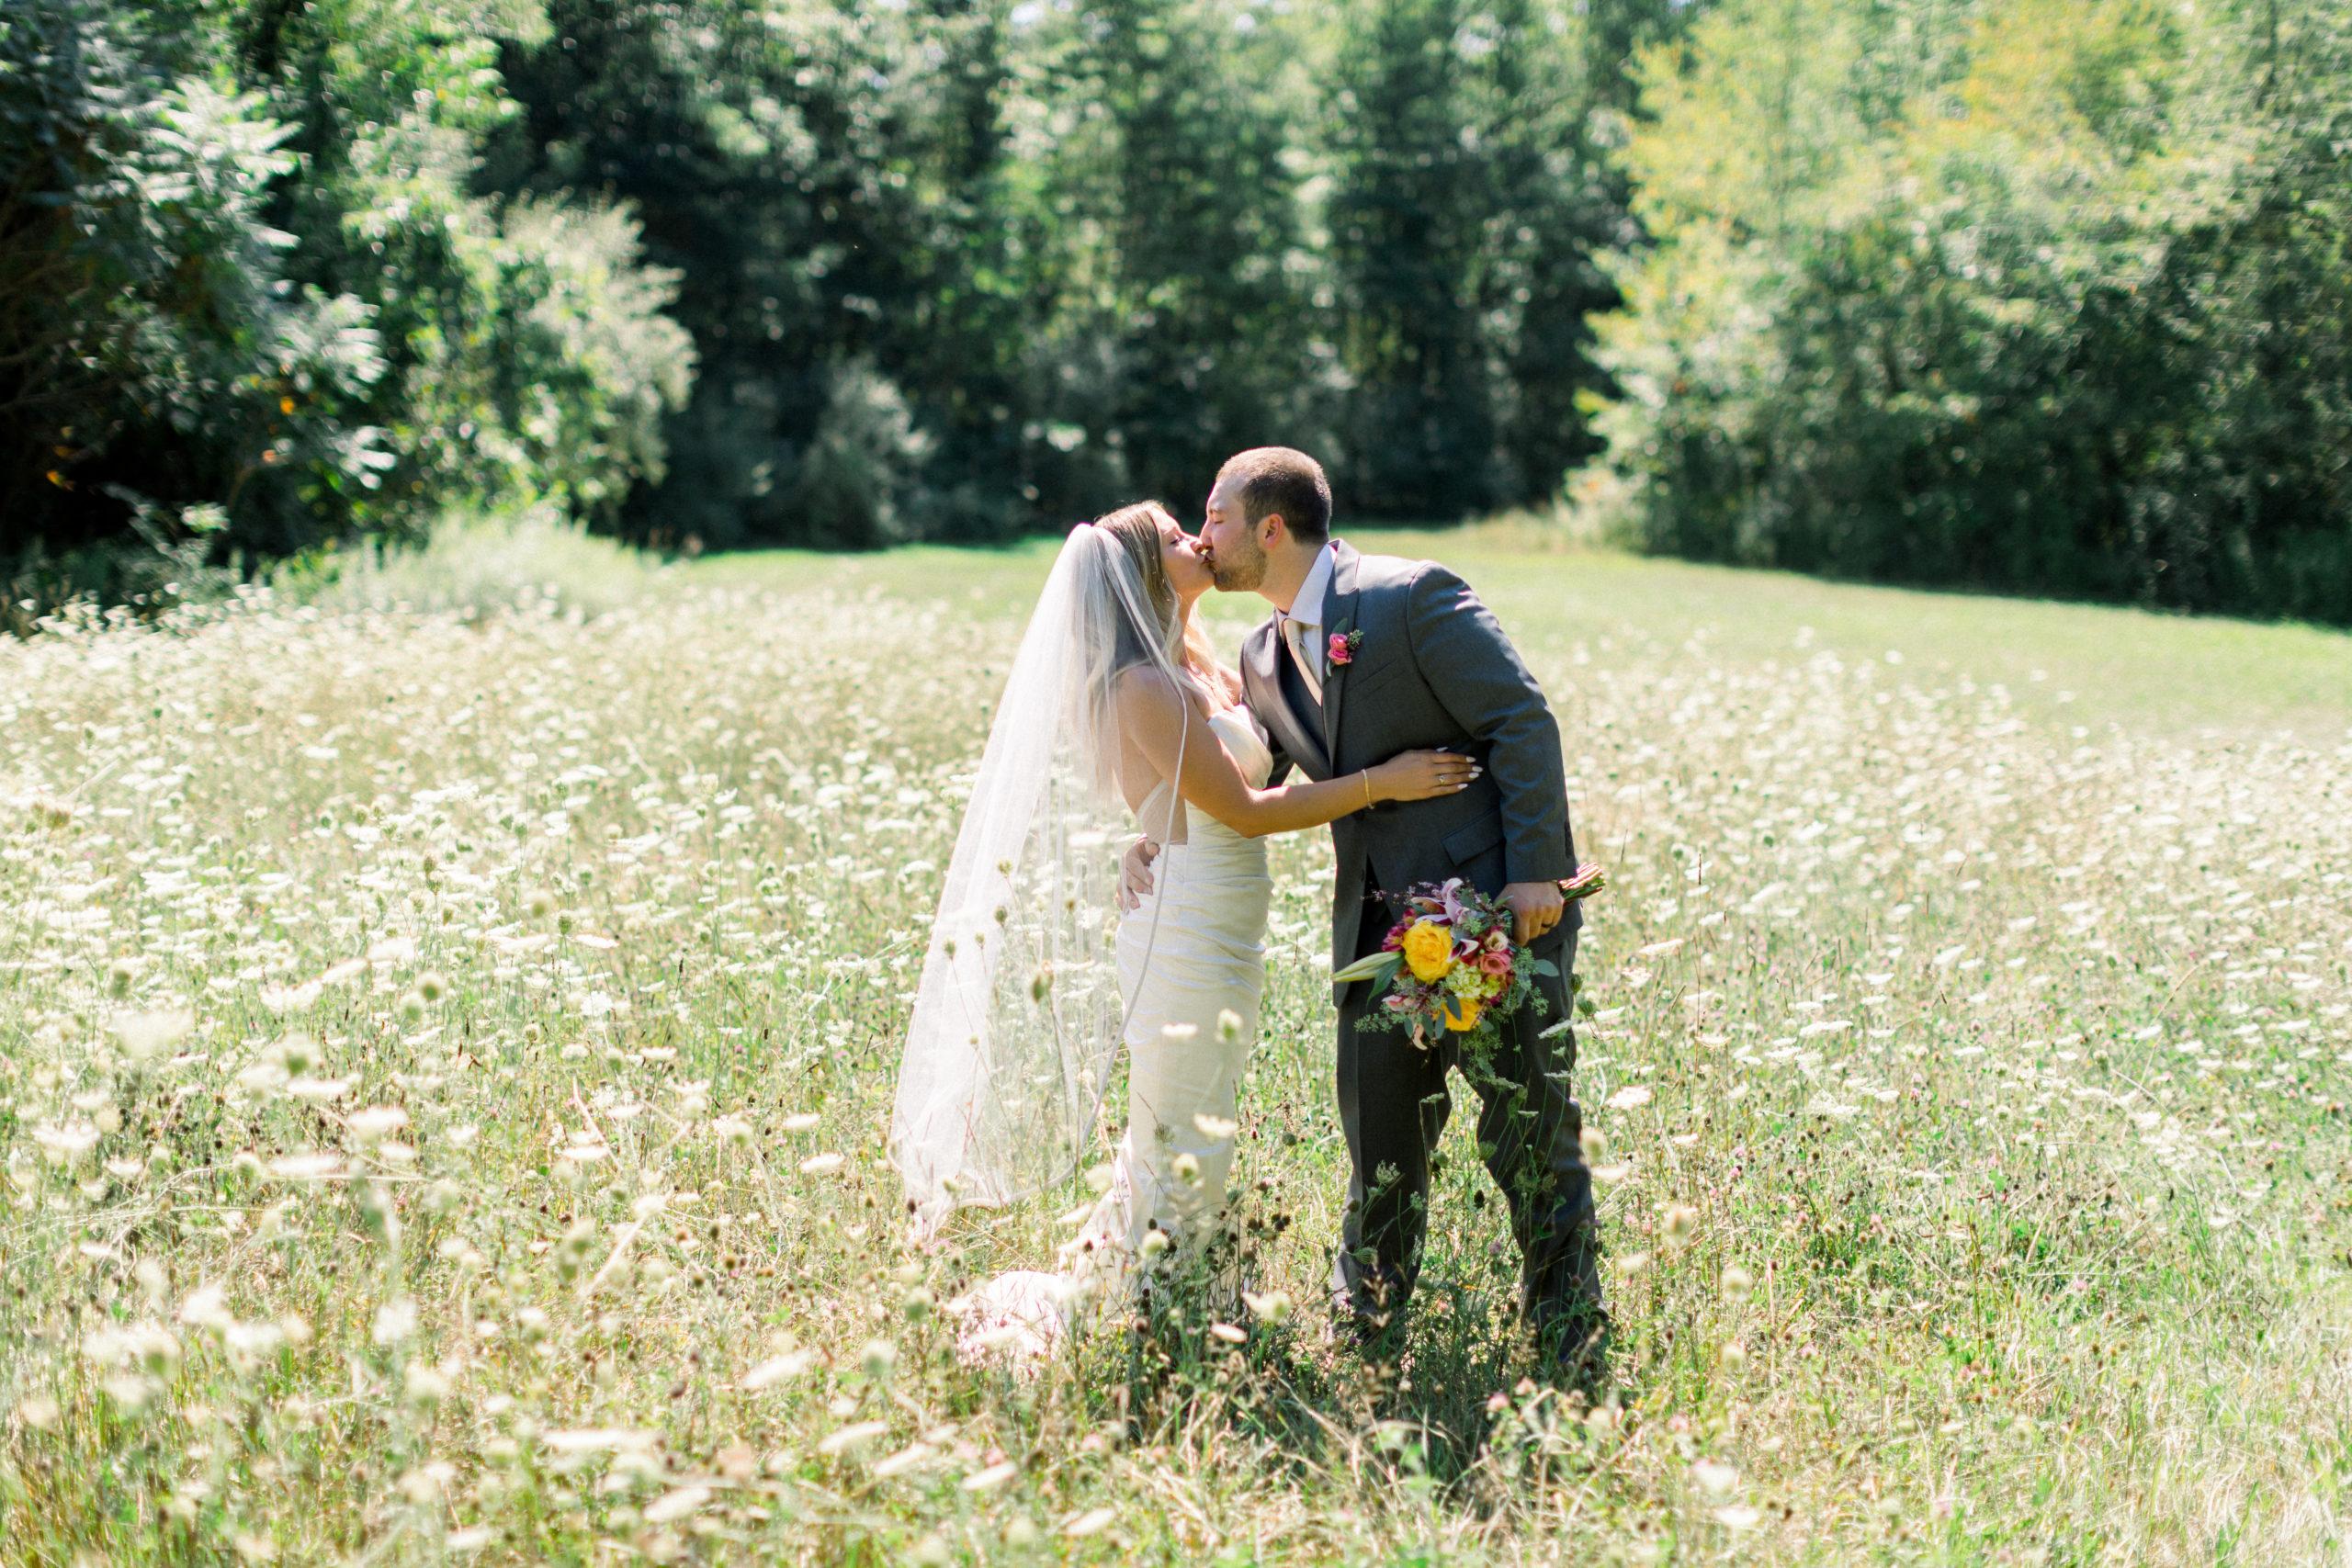 Couple kiss in field of flowers